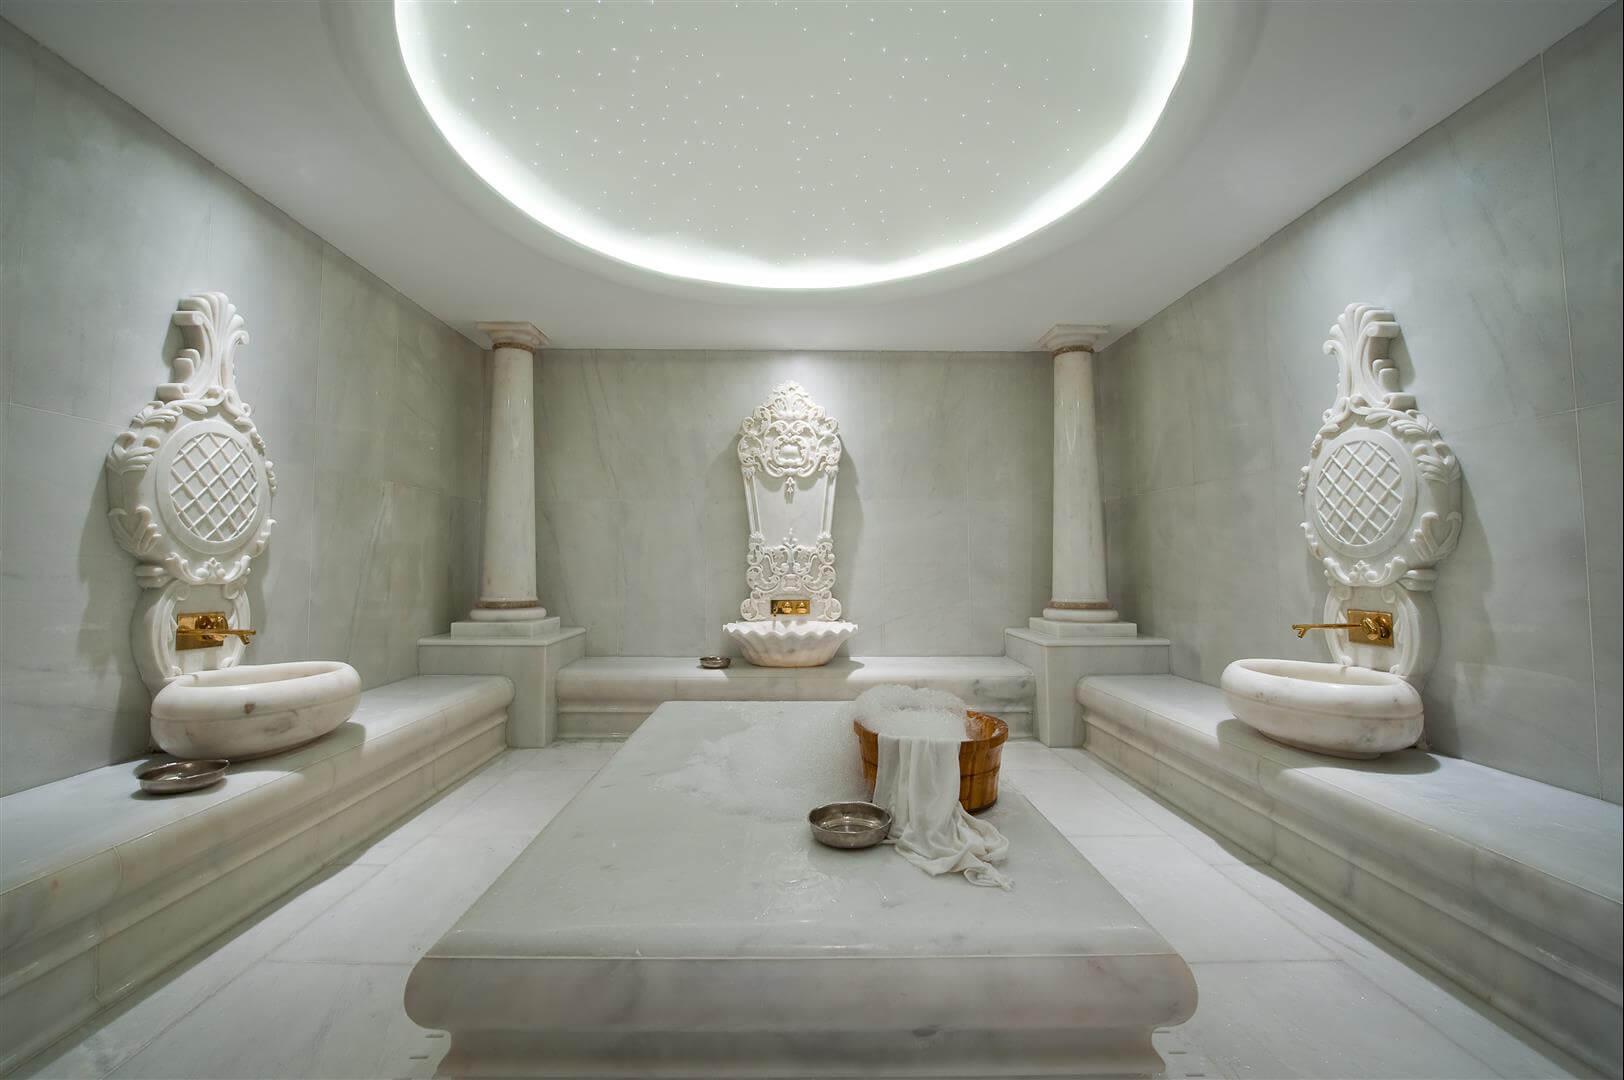 Afyon White Arcobaleno Marble